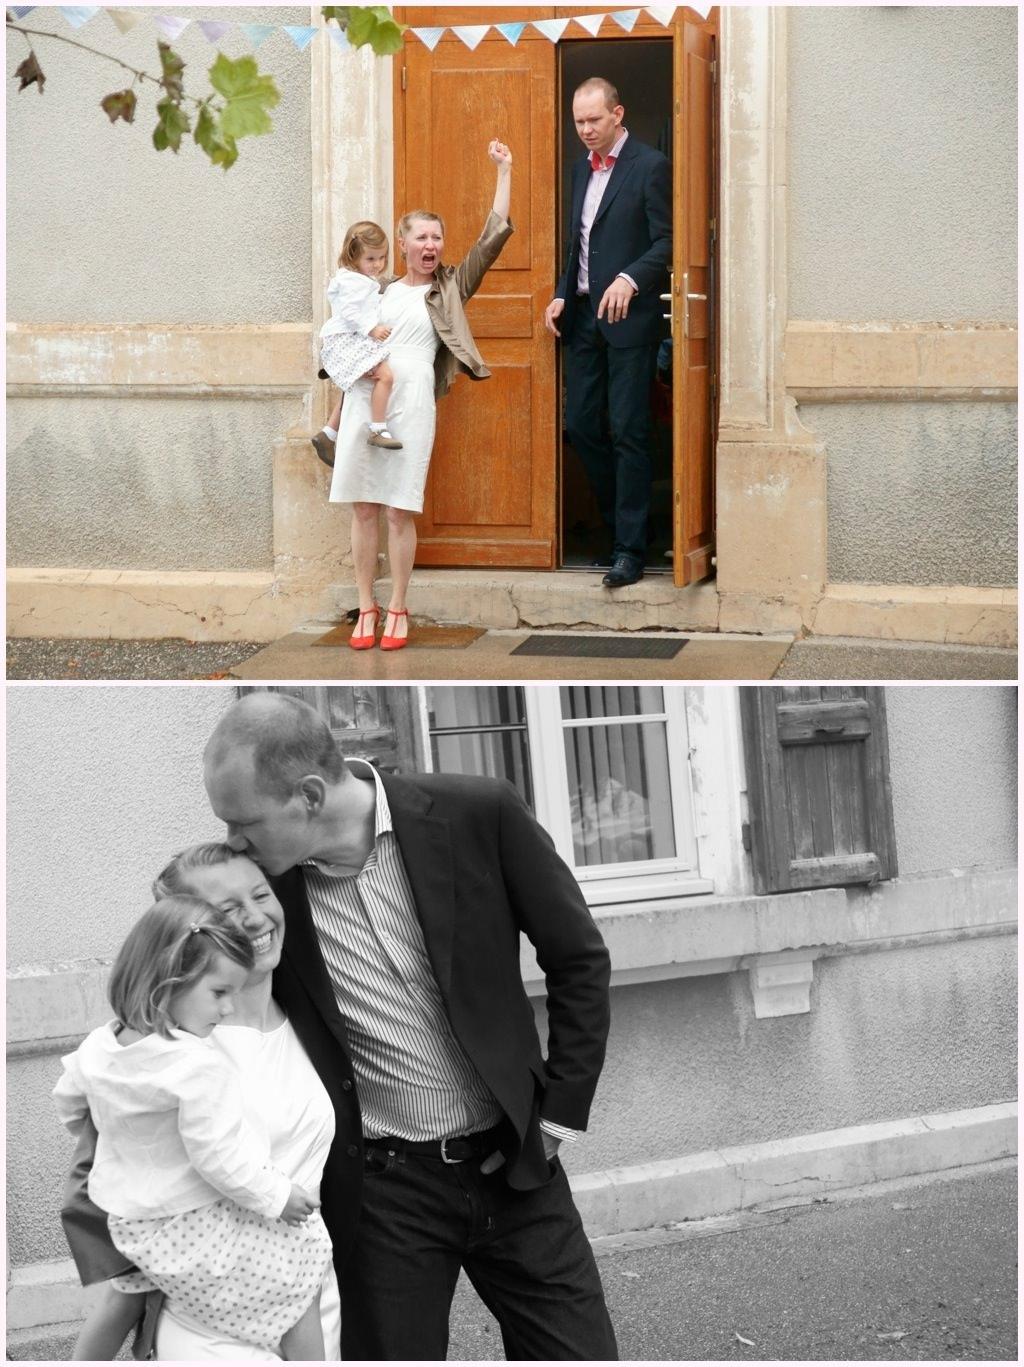 photographe mariage grenoble cérémonie civile sortie mairie